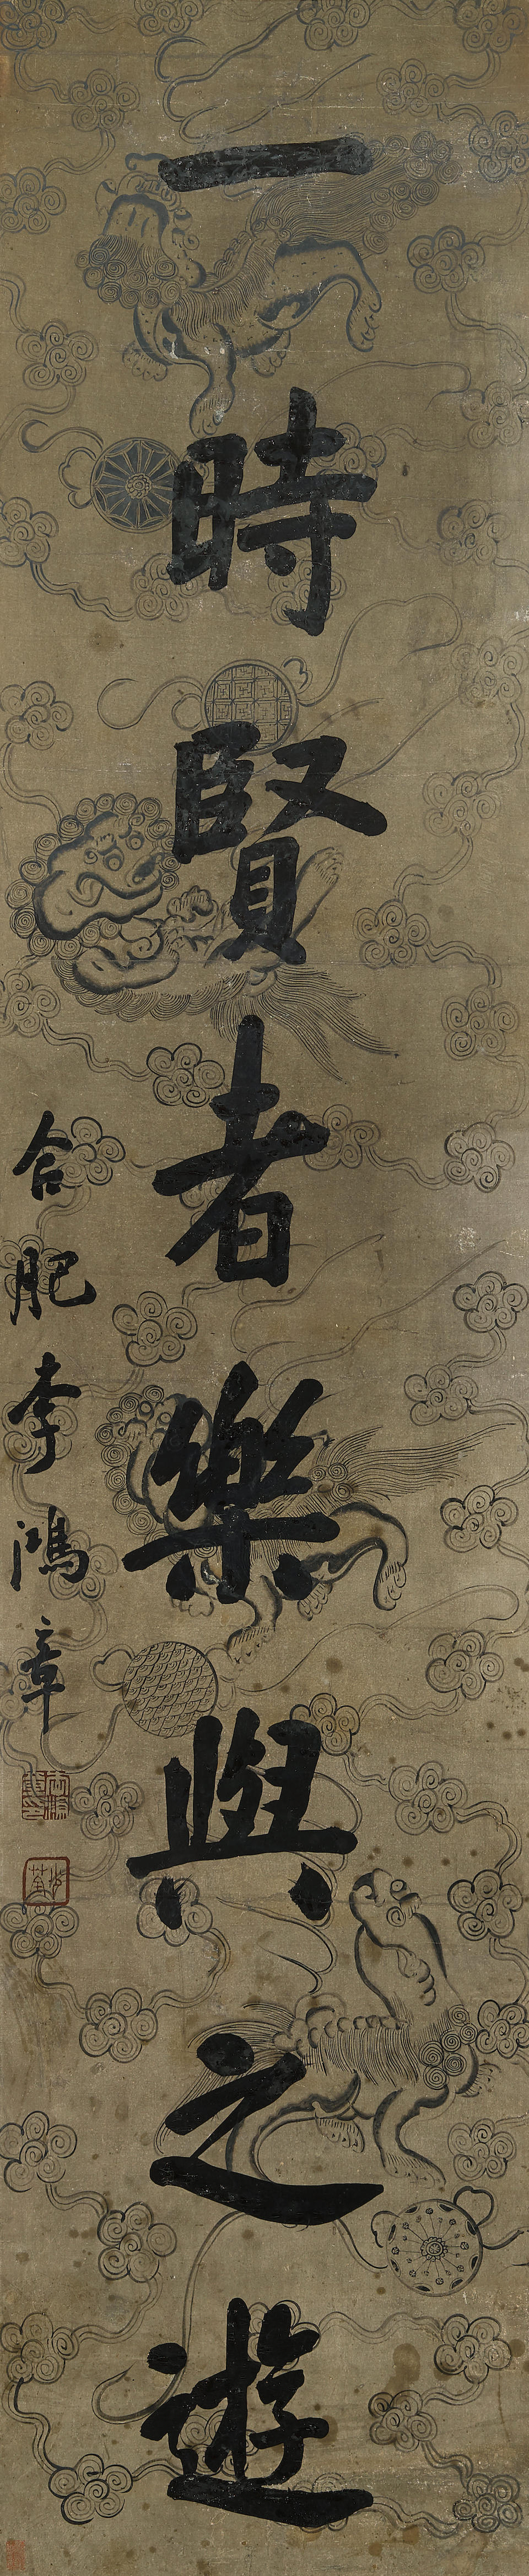 Li Hongzhang (1823-1901)  Couplet in Running Script